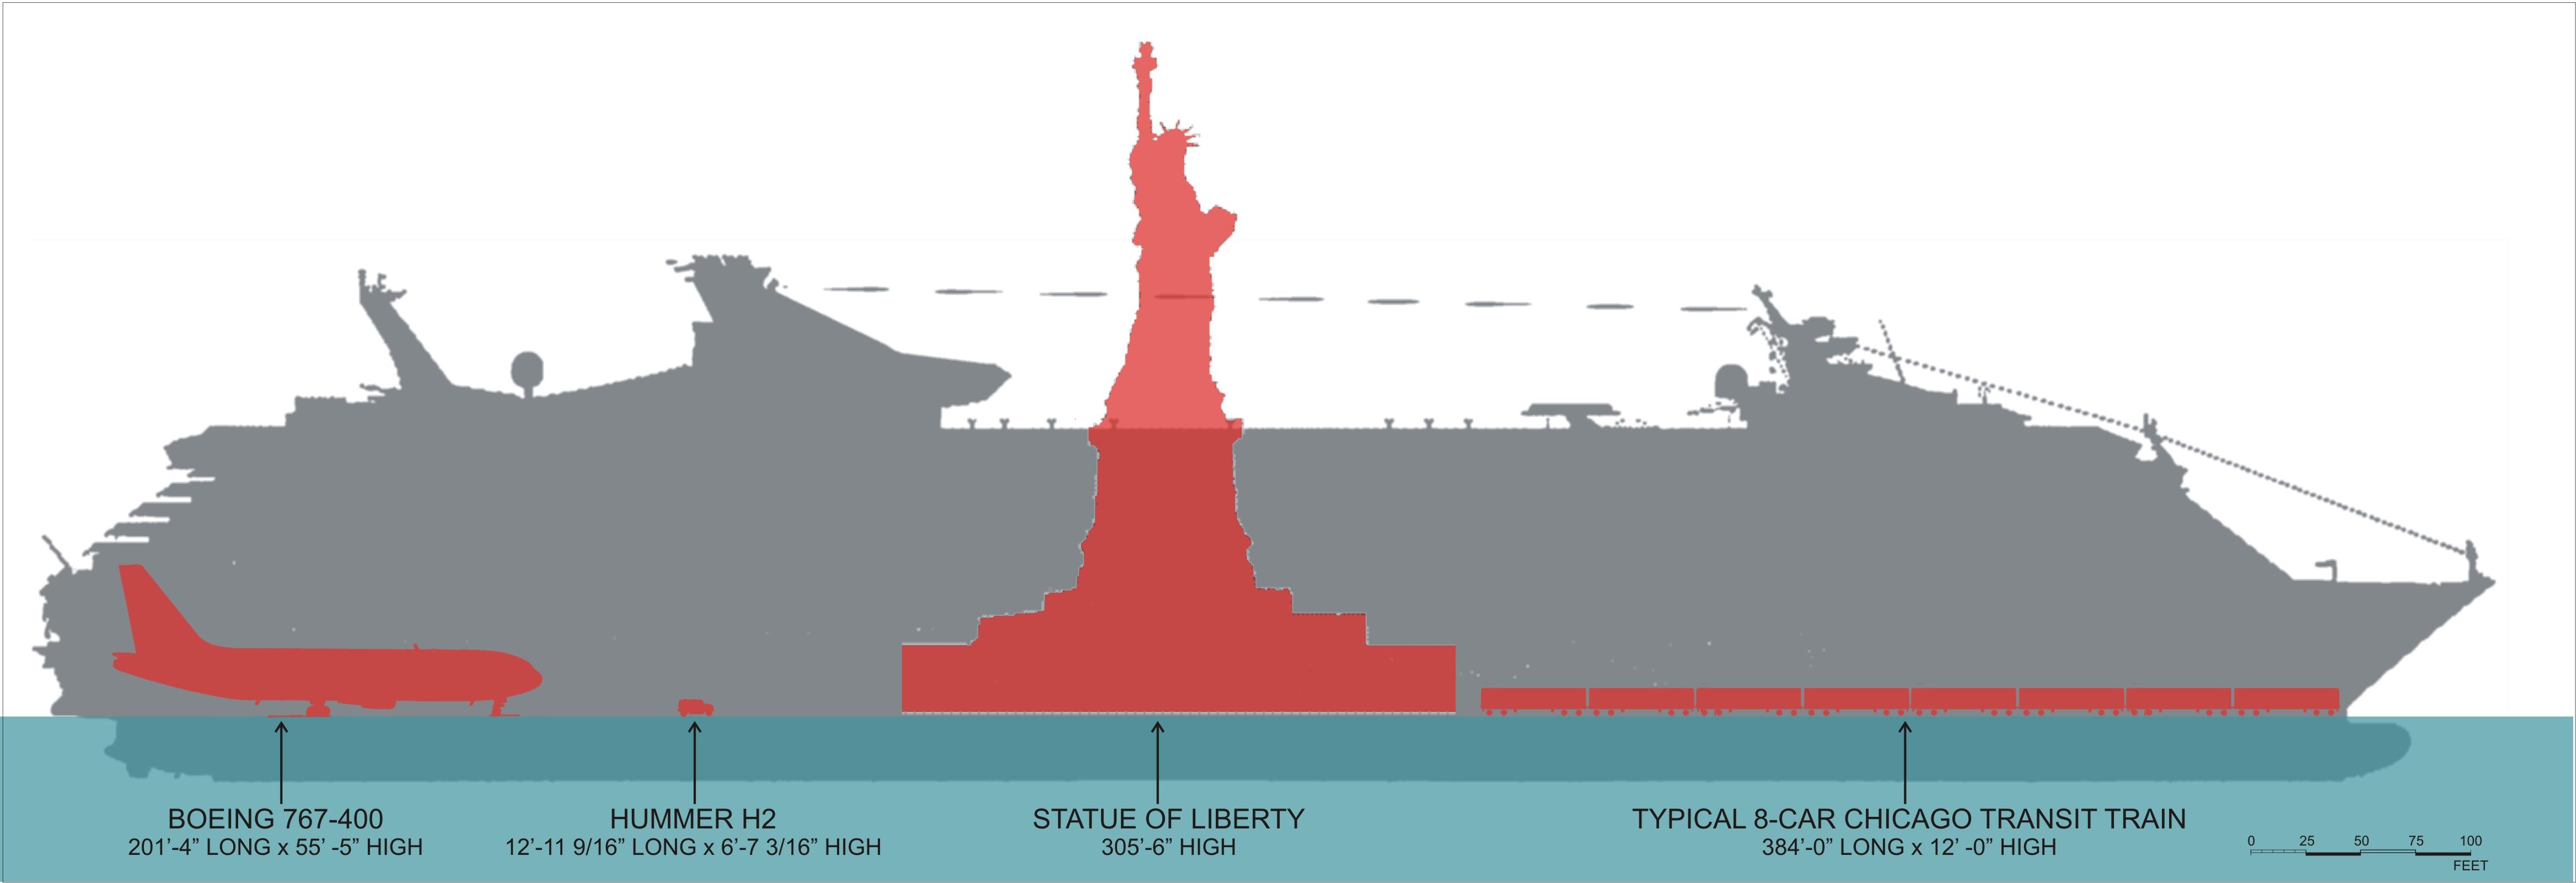 Weight Size Chart: Freedom-Class Comparison.jpg - Wikimedia Commons,Chart